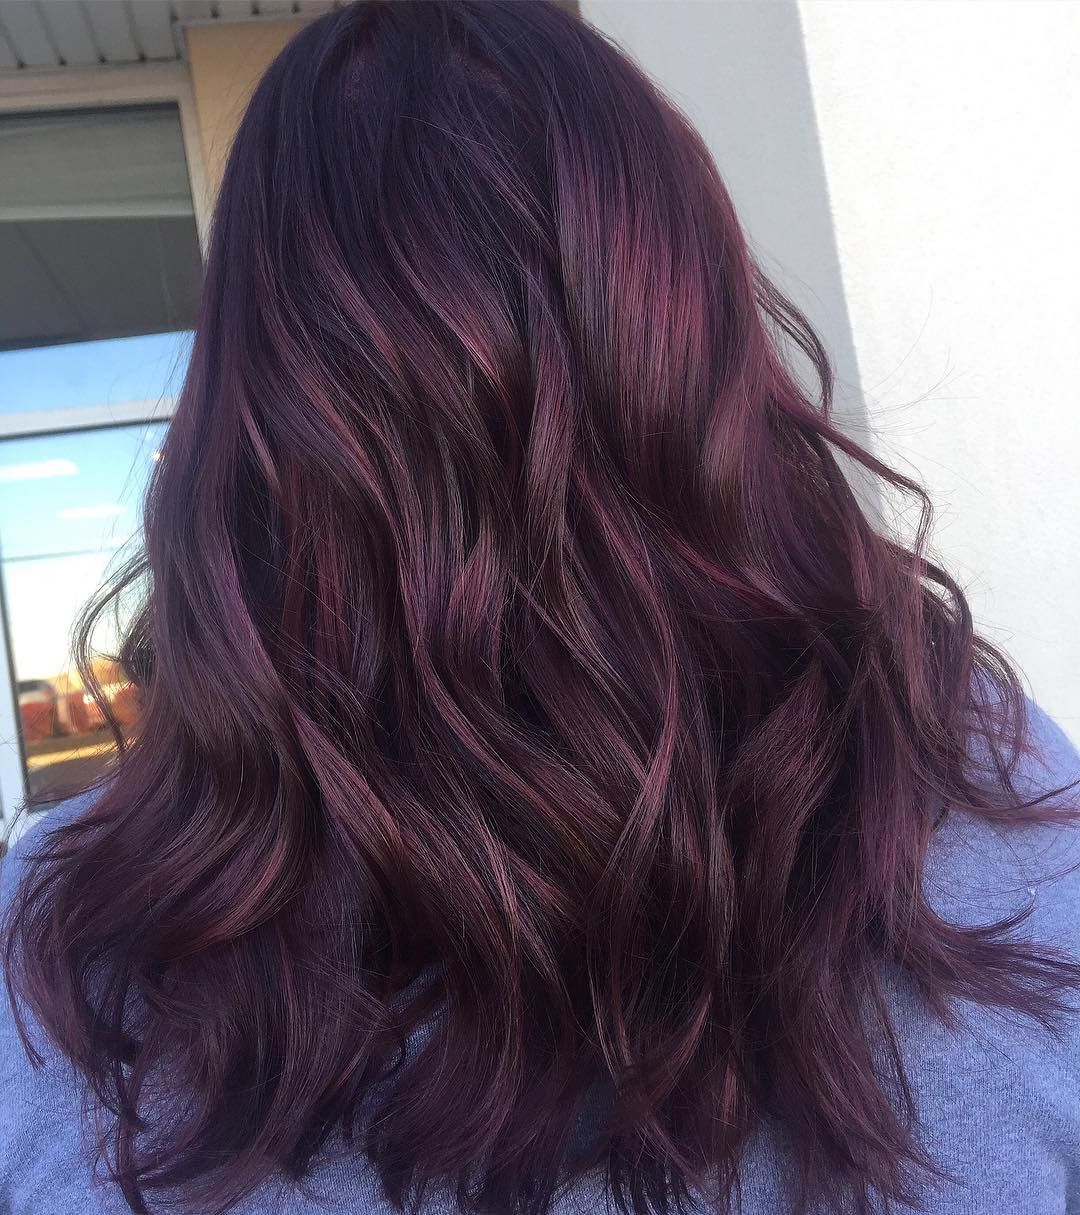 Pinterest hailcab her hair pinterest hair coloring hair